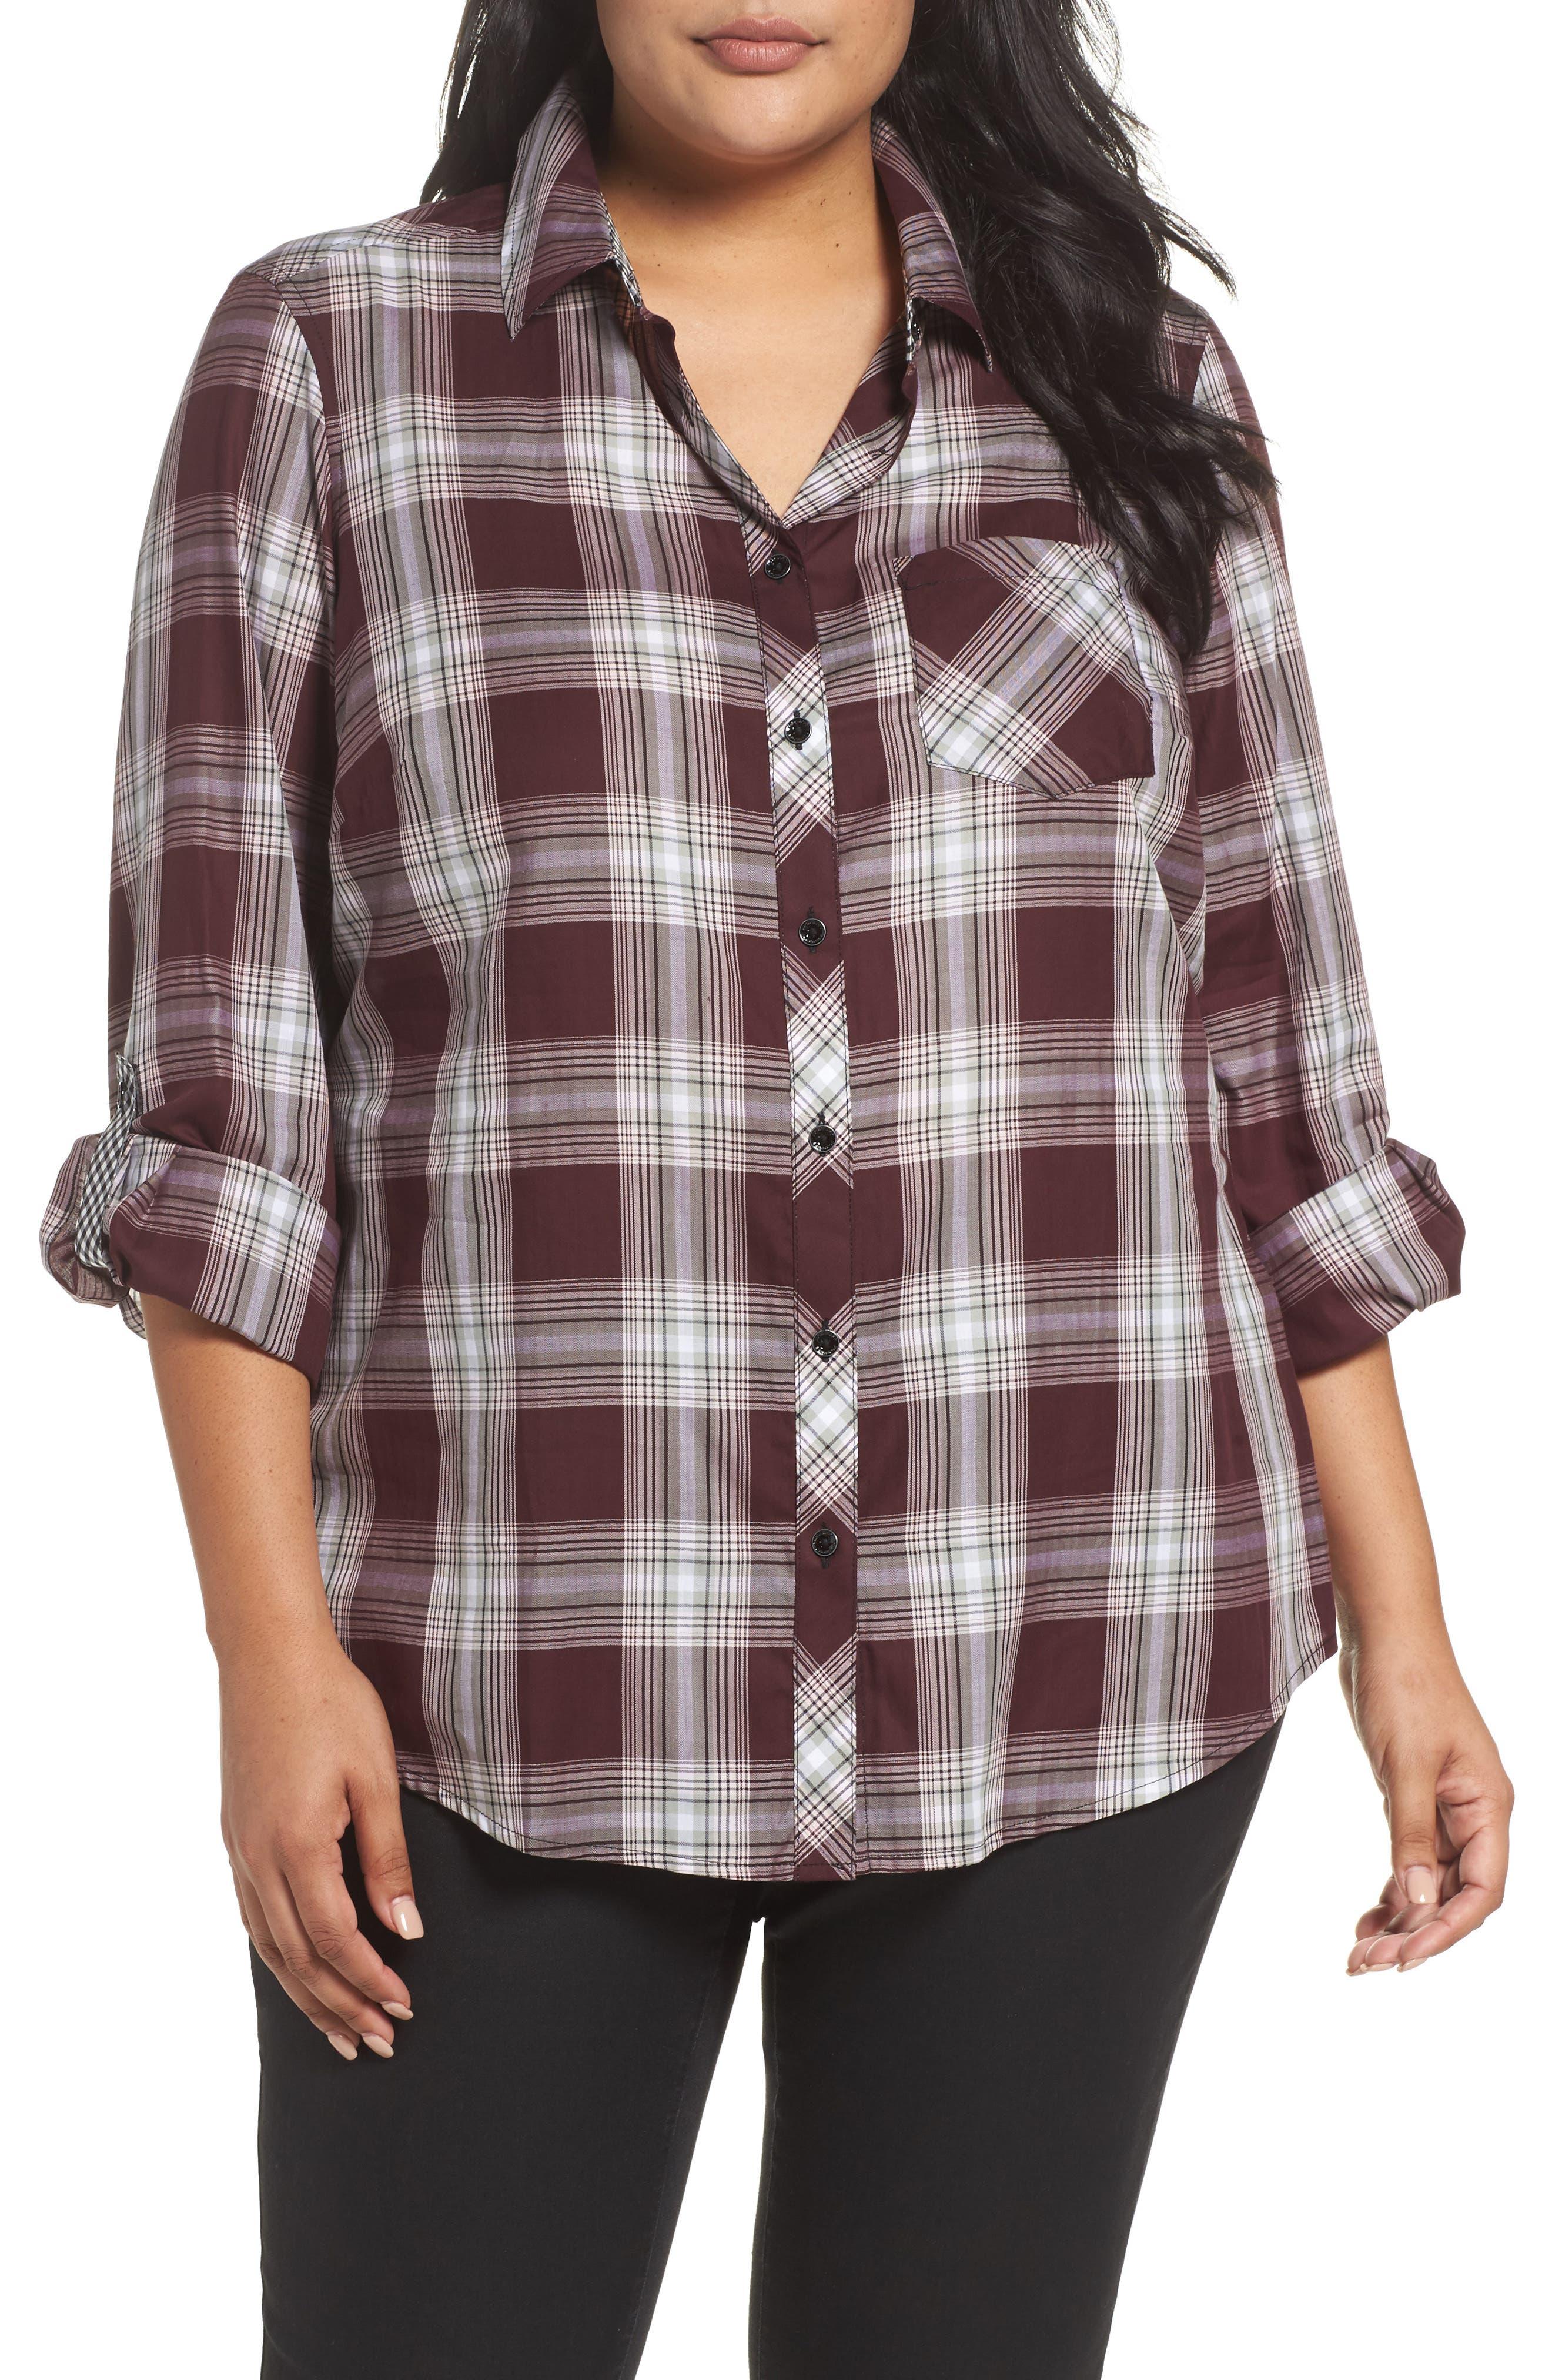 Alternate Image 1 Selected - Foxcroft Addison Plaid Cotton Shirt (Plus Size)